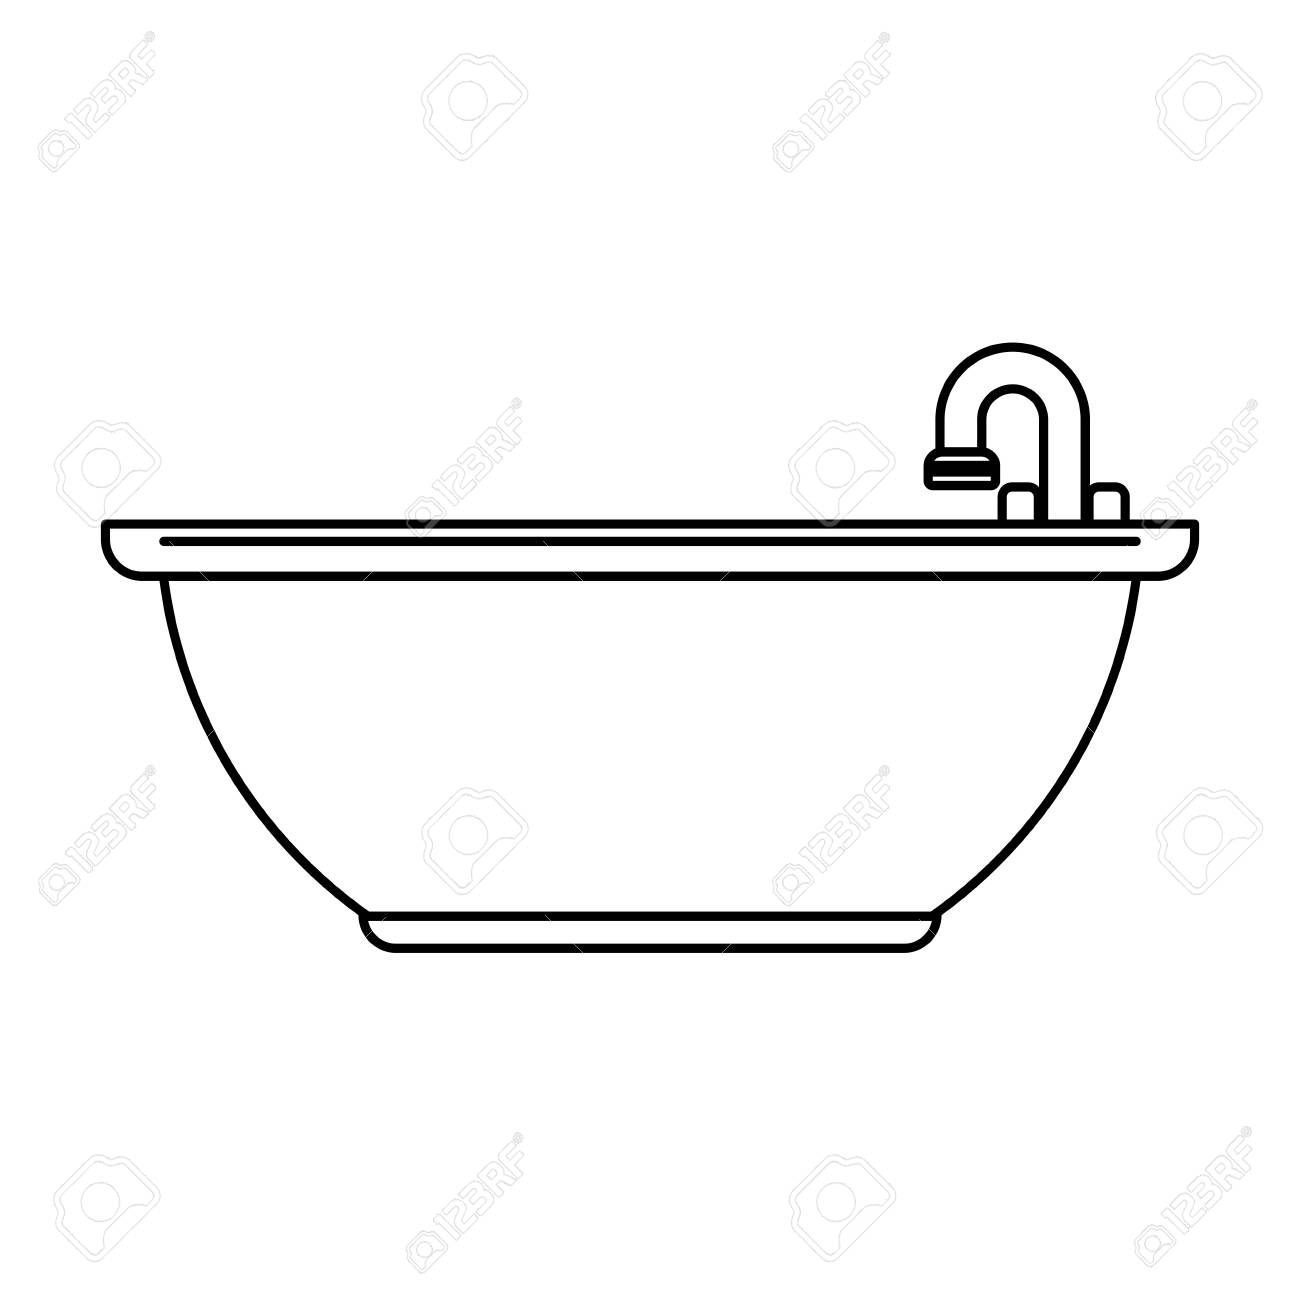 Bathtub Bathware Item Icon Image Vector Illustration Design ...